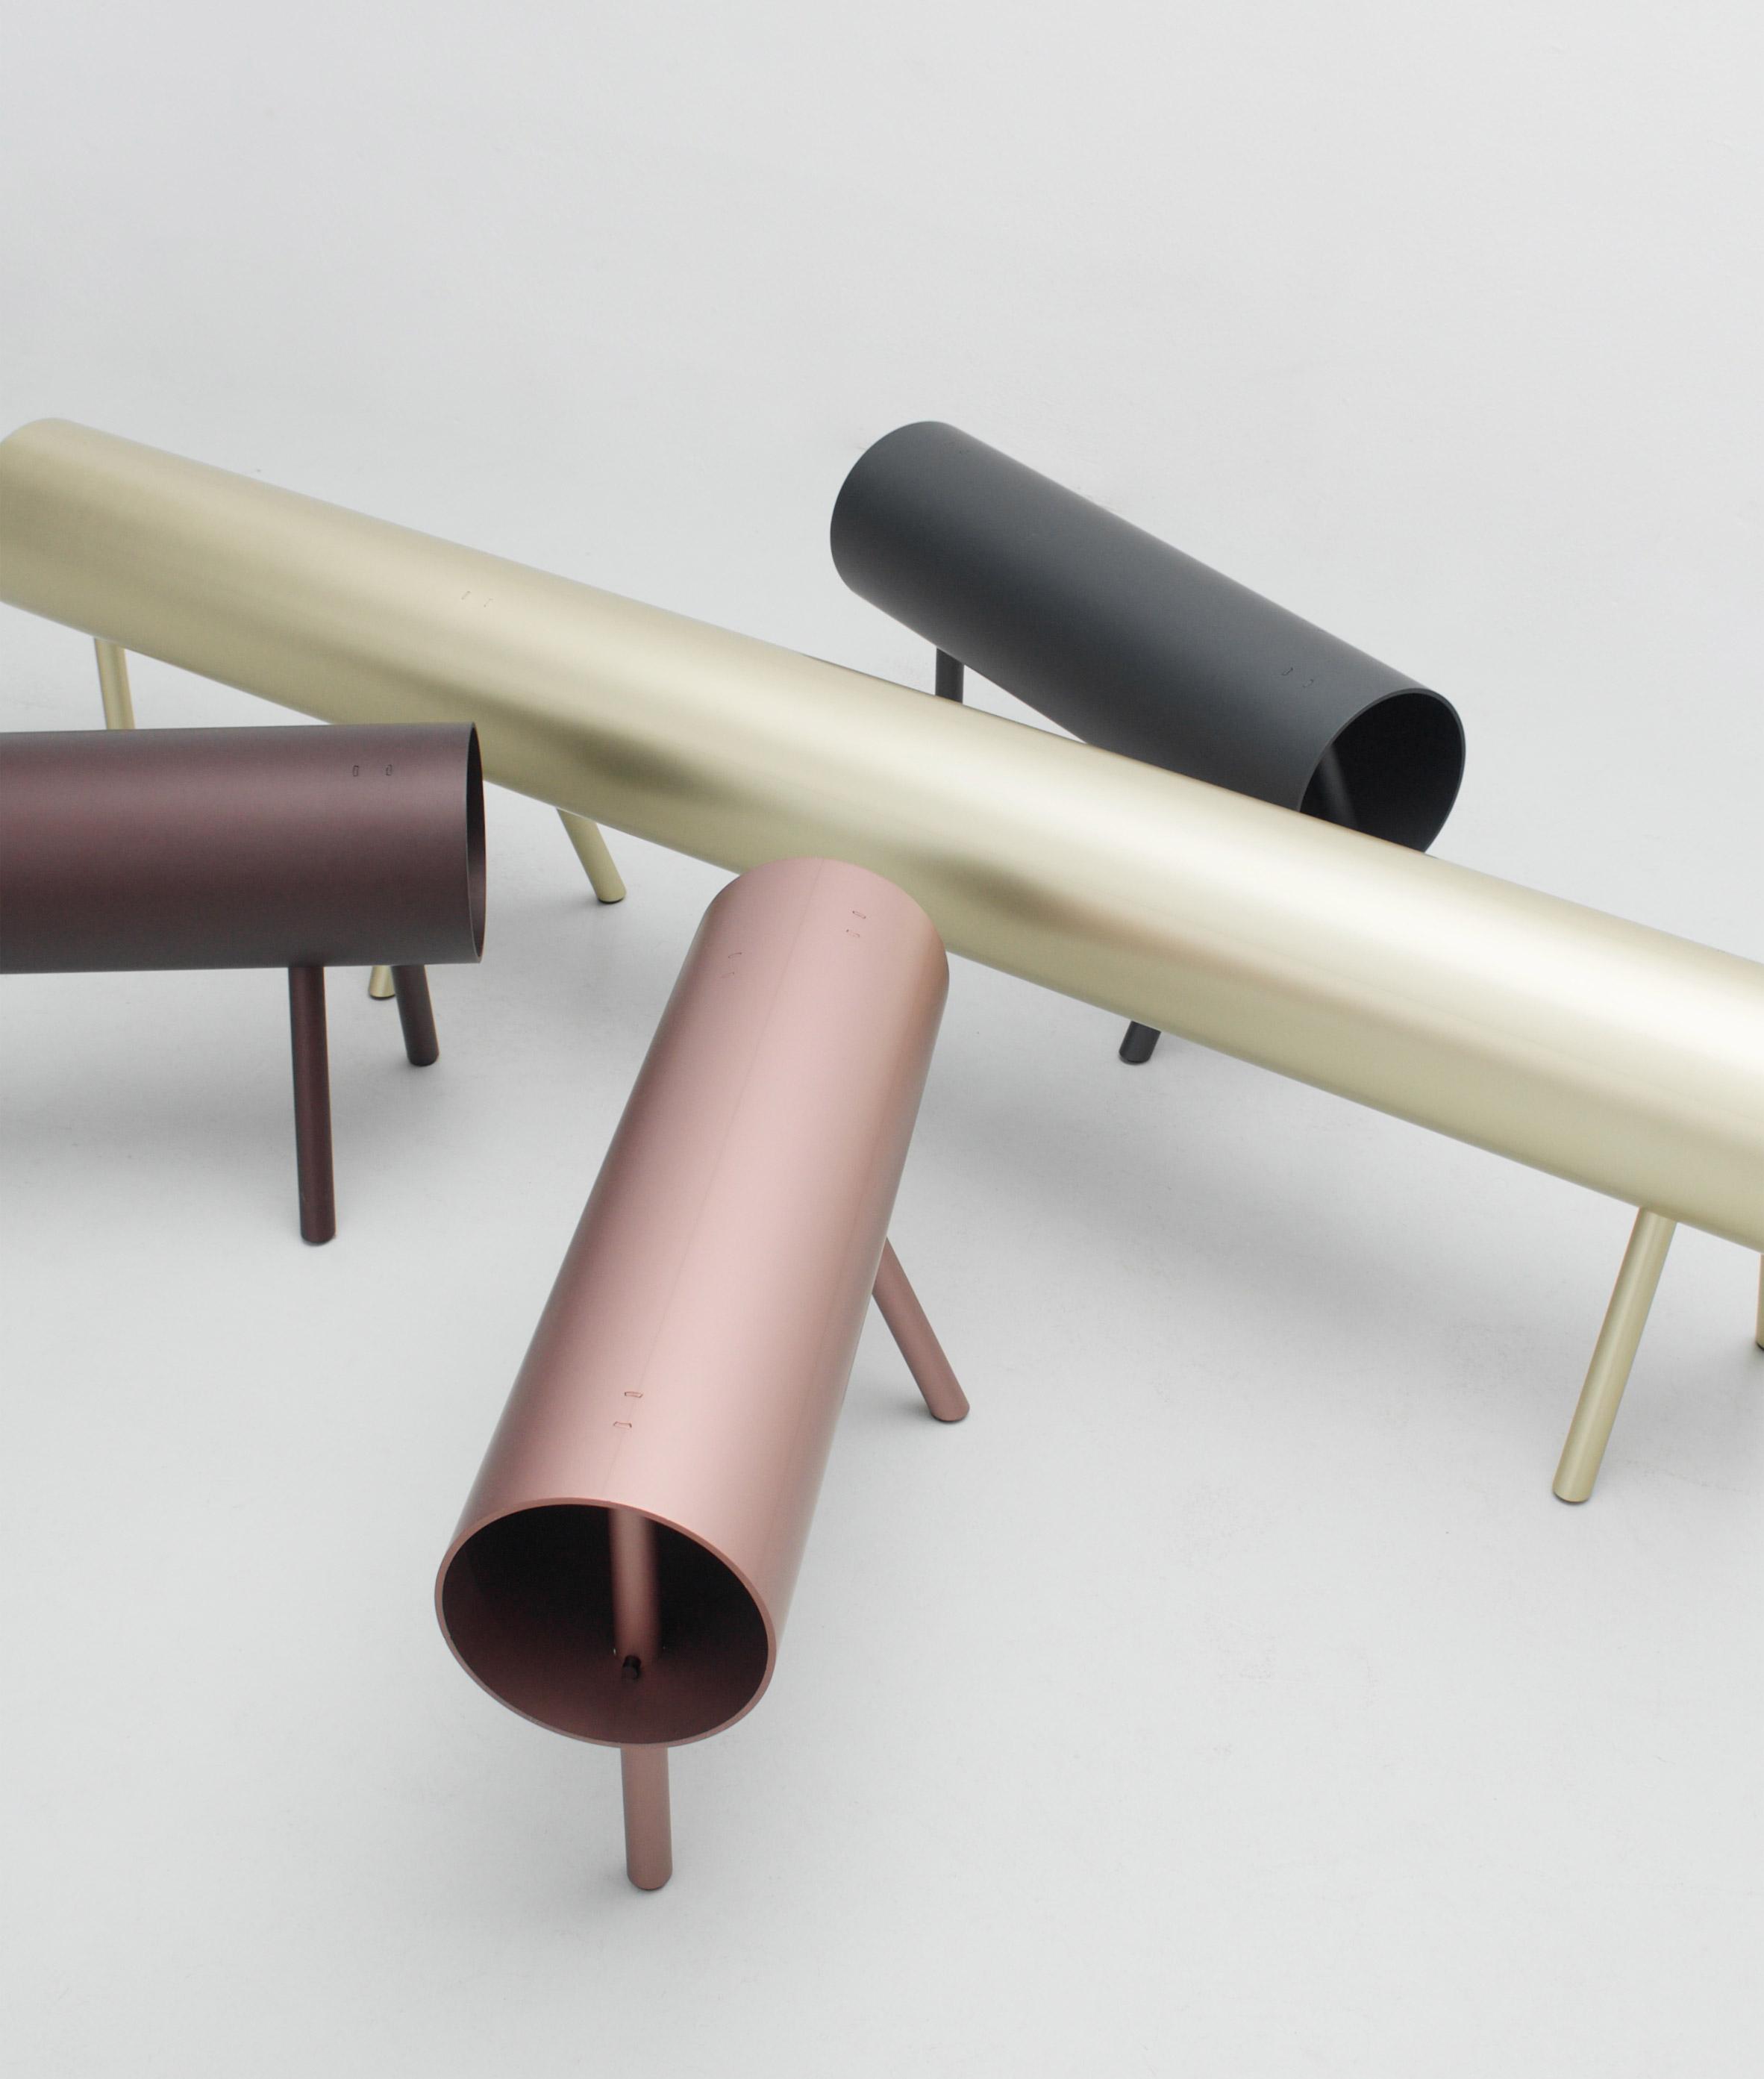 OS & OOS creates sawhorse-inspired furniture using aluminium pipes